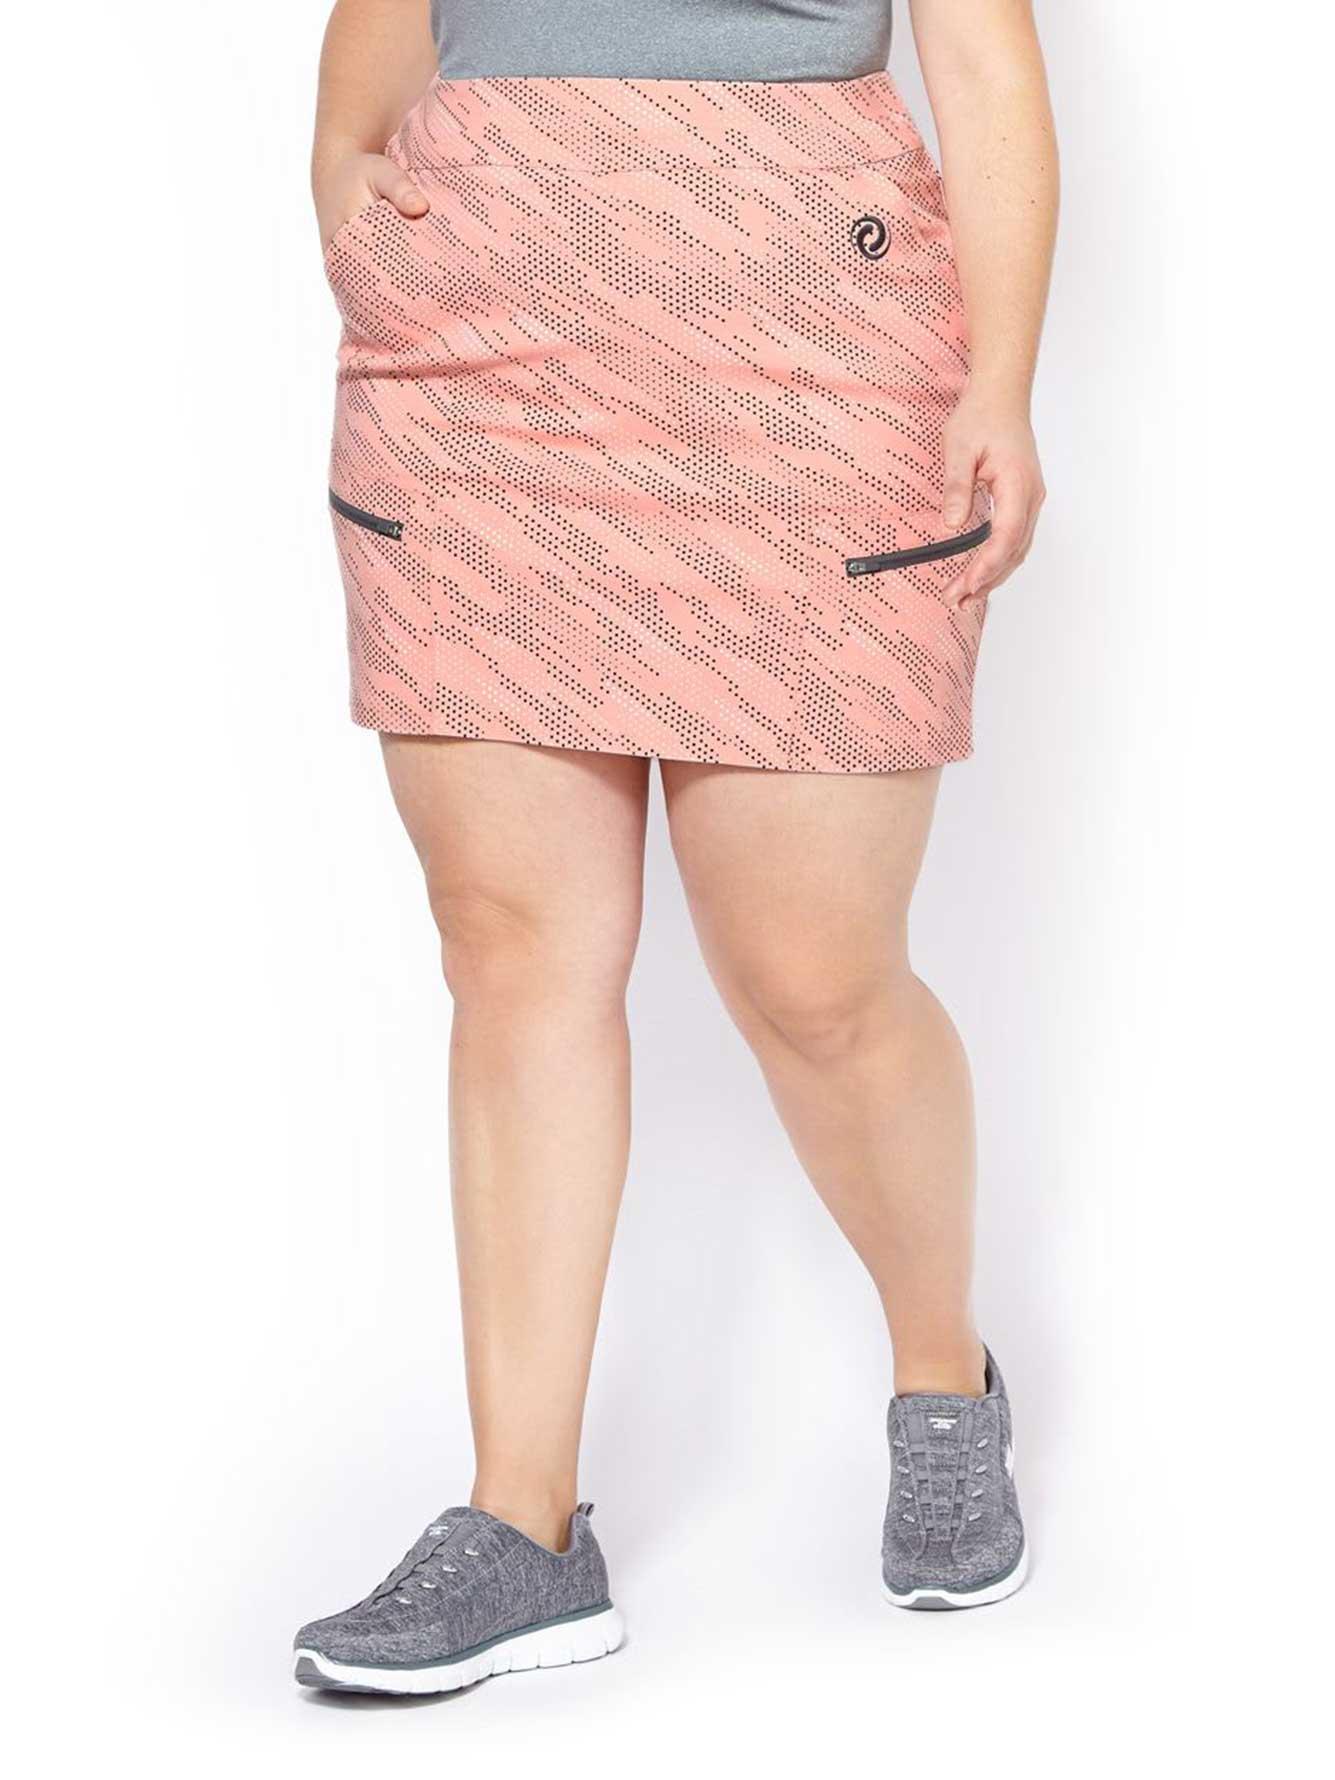 sports jupe culotte de golf taille plus imprim e penningtons. Black Bedroom Furniture Sets. Home Design Ideas